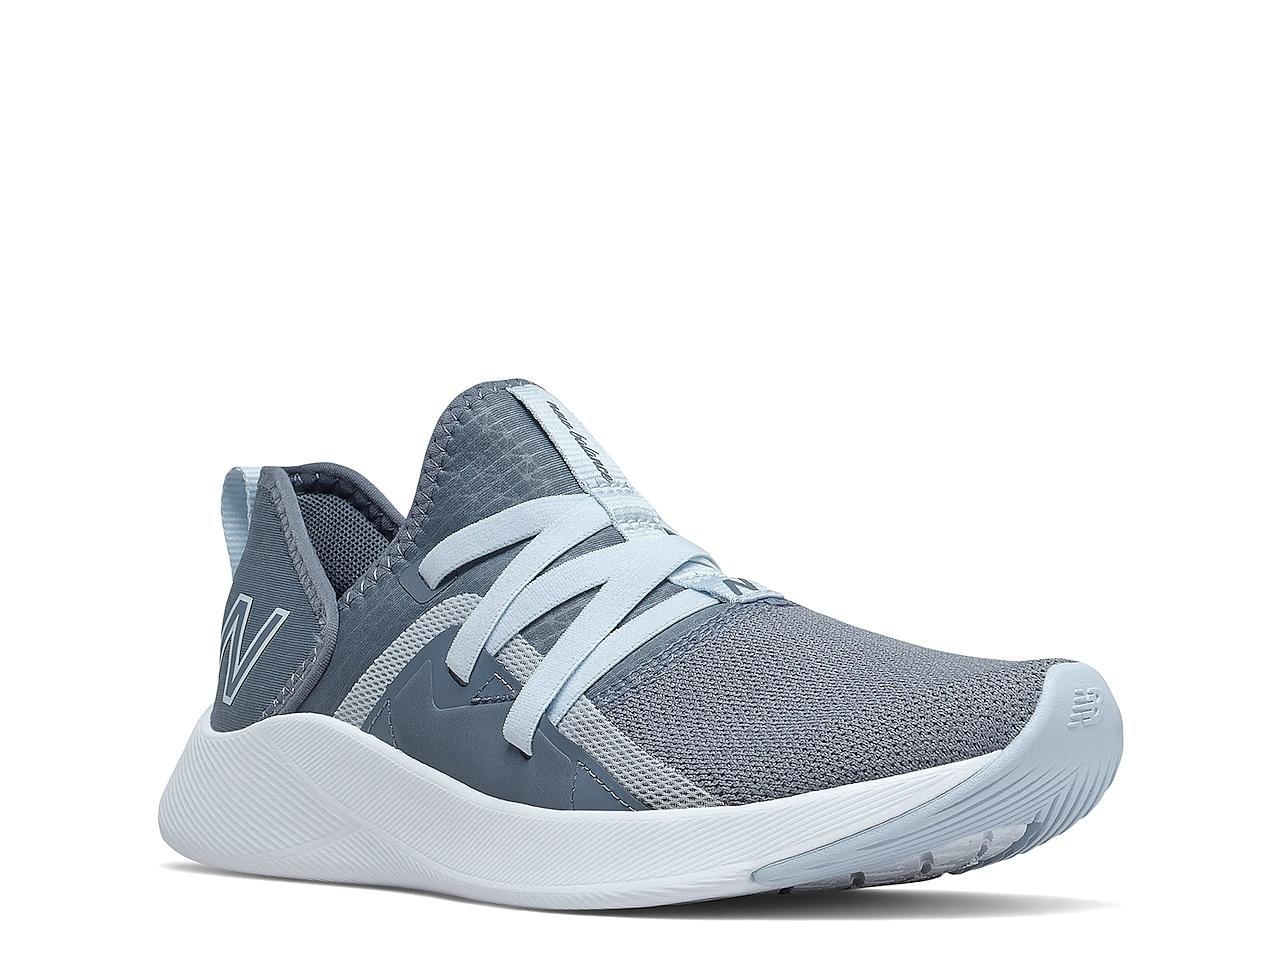 New Balance Beaya Slip-On Sneaker - Women's